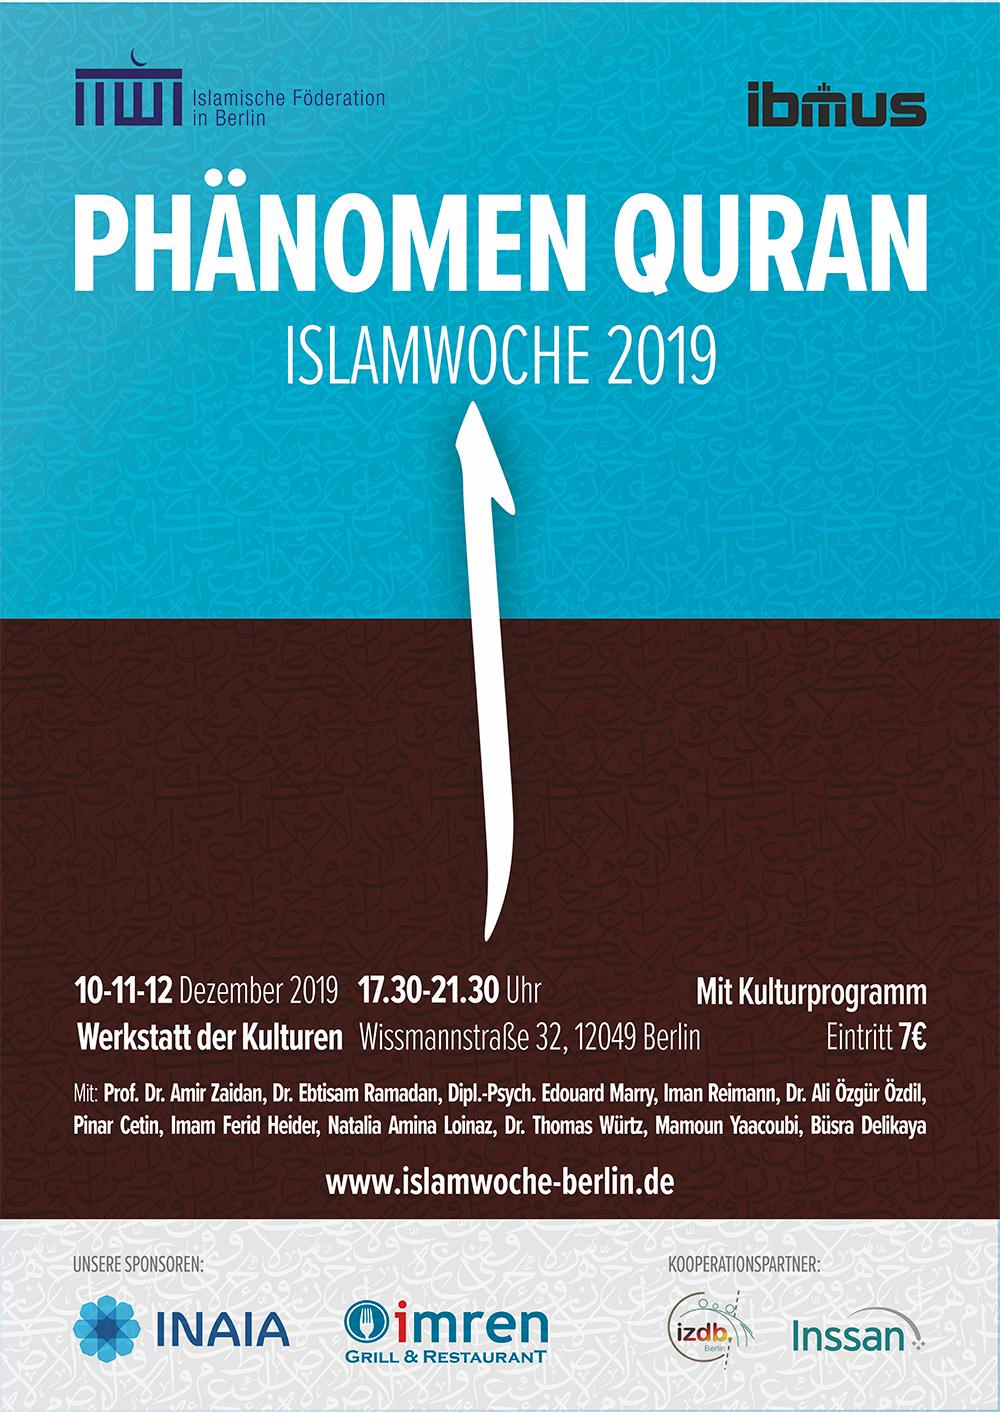 Islamwoche Berlin 2019 – Phänomen Quran